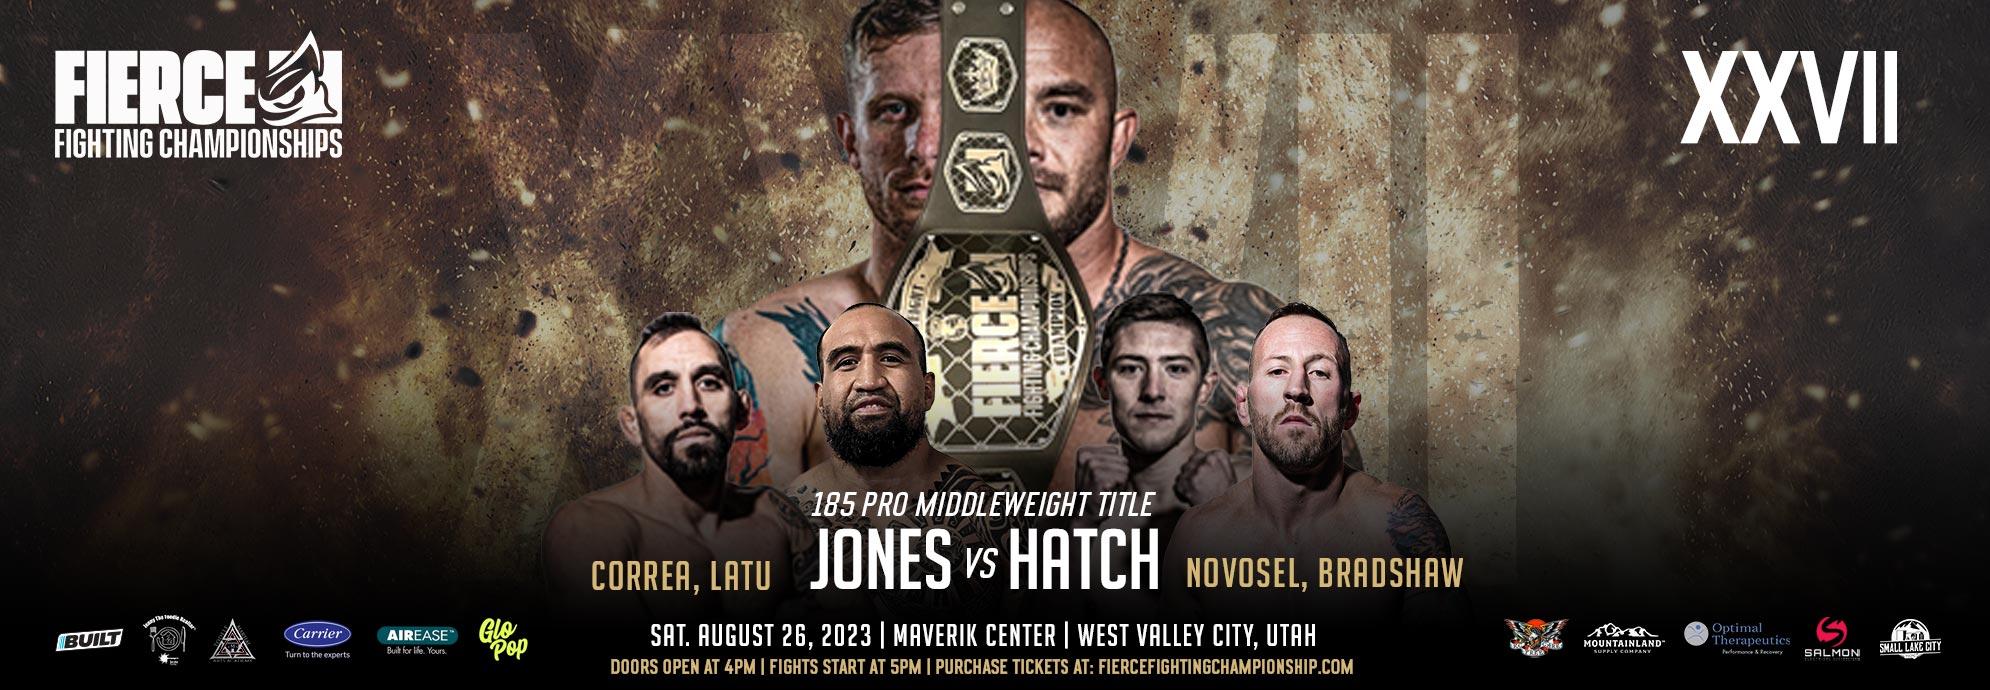 2020 PAC-12 Women's Gymnastics Championship